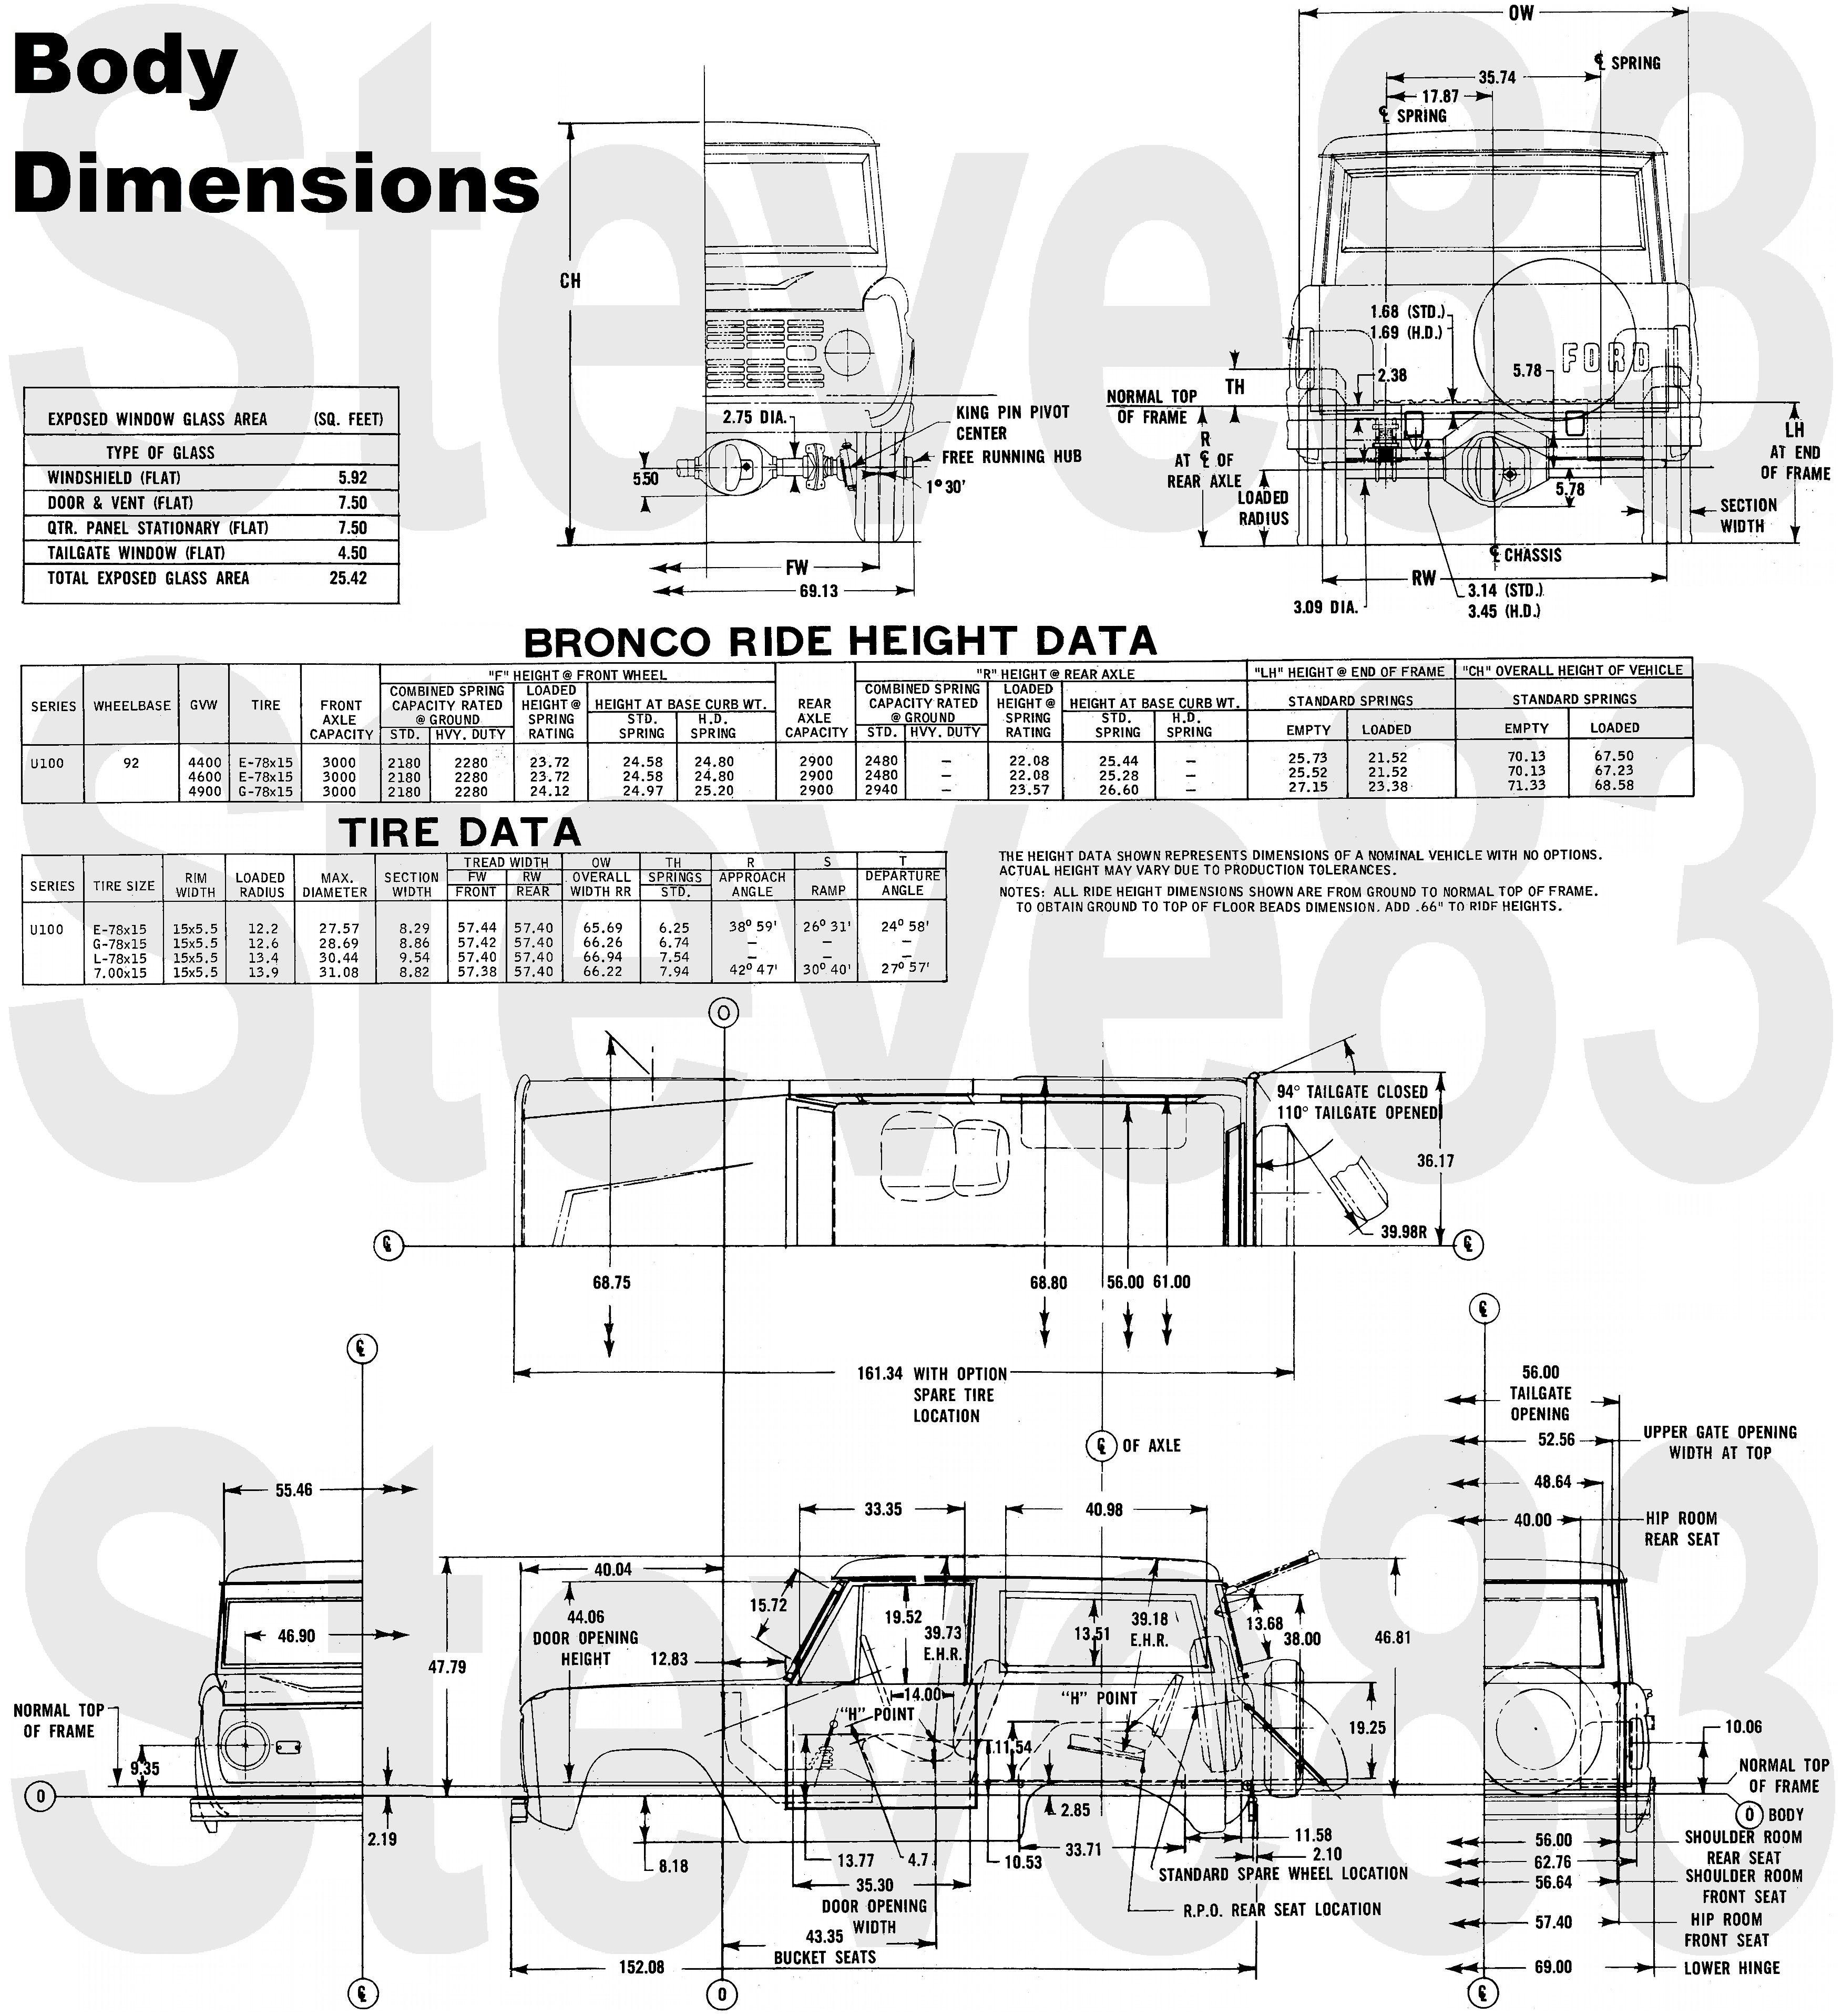 small resolution of ford bronco frame diagram basic guide wiring diagram u2022 1974 ford bronco 302 vacuum diagram